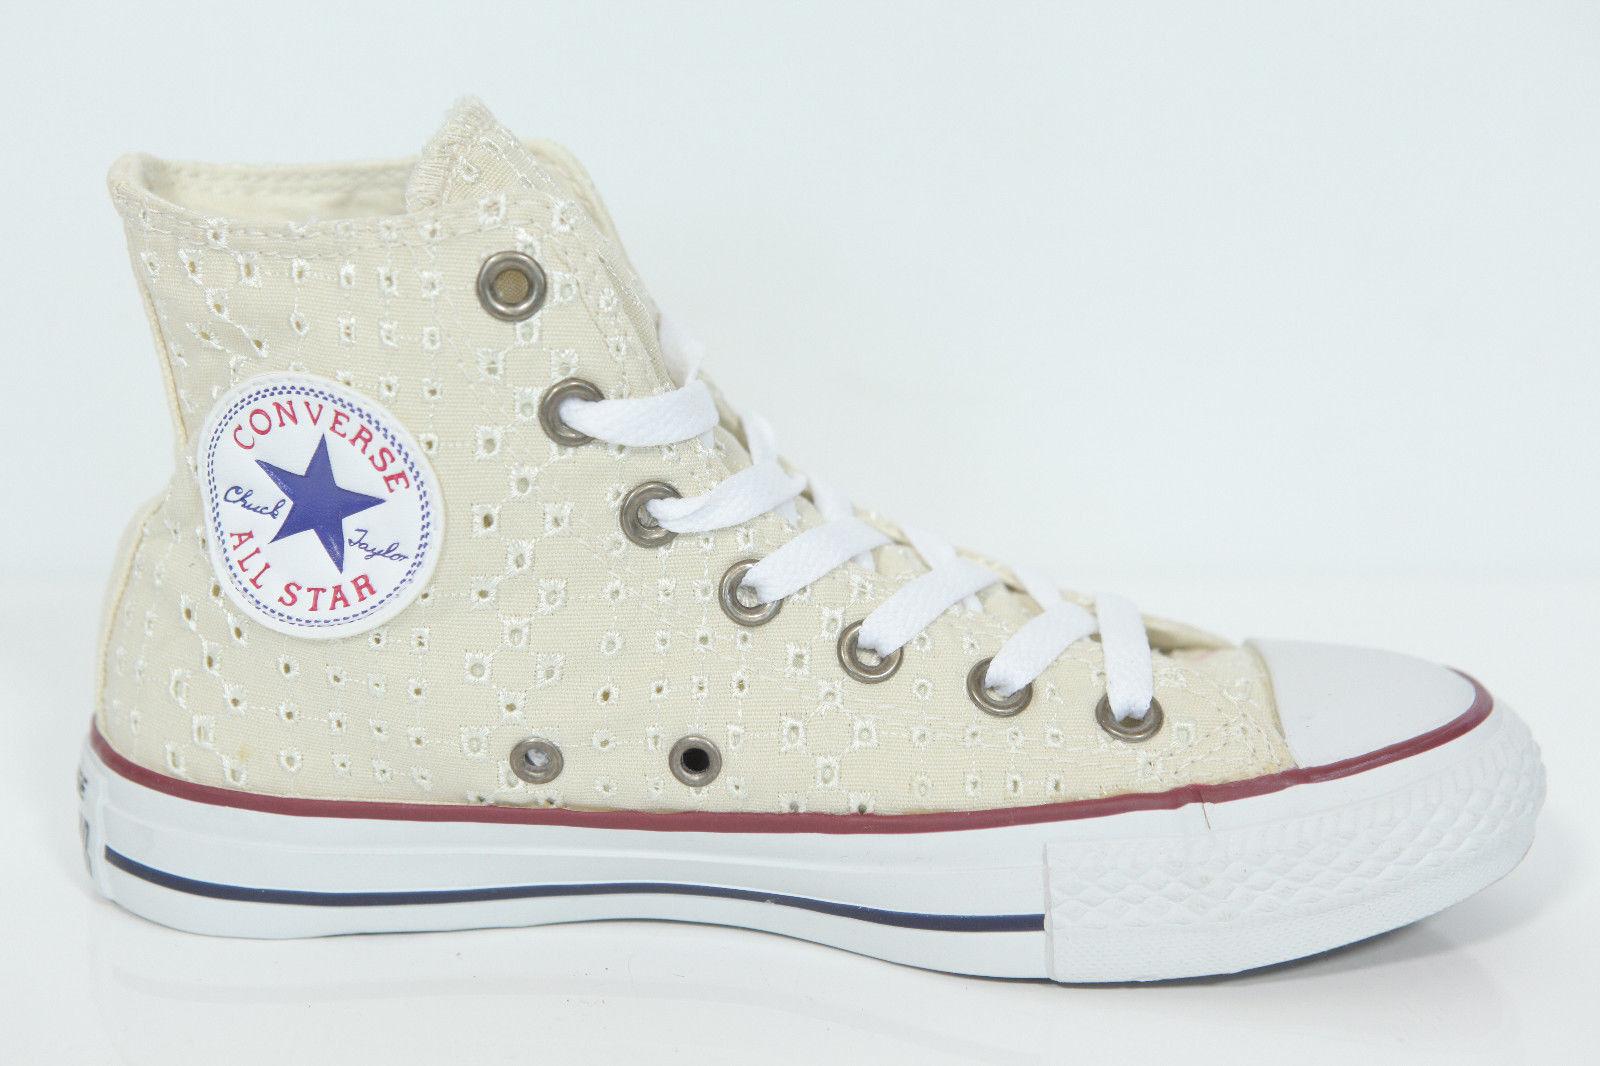 Nuevo All Star Converse Chucks Chucks Chucks Hi eyelet natural 542538c High Top cortos retro  seguro de calidad